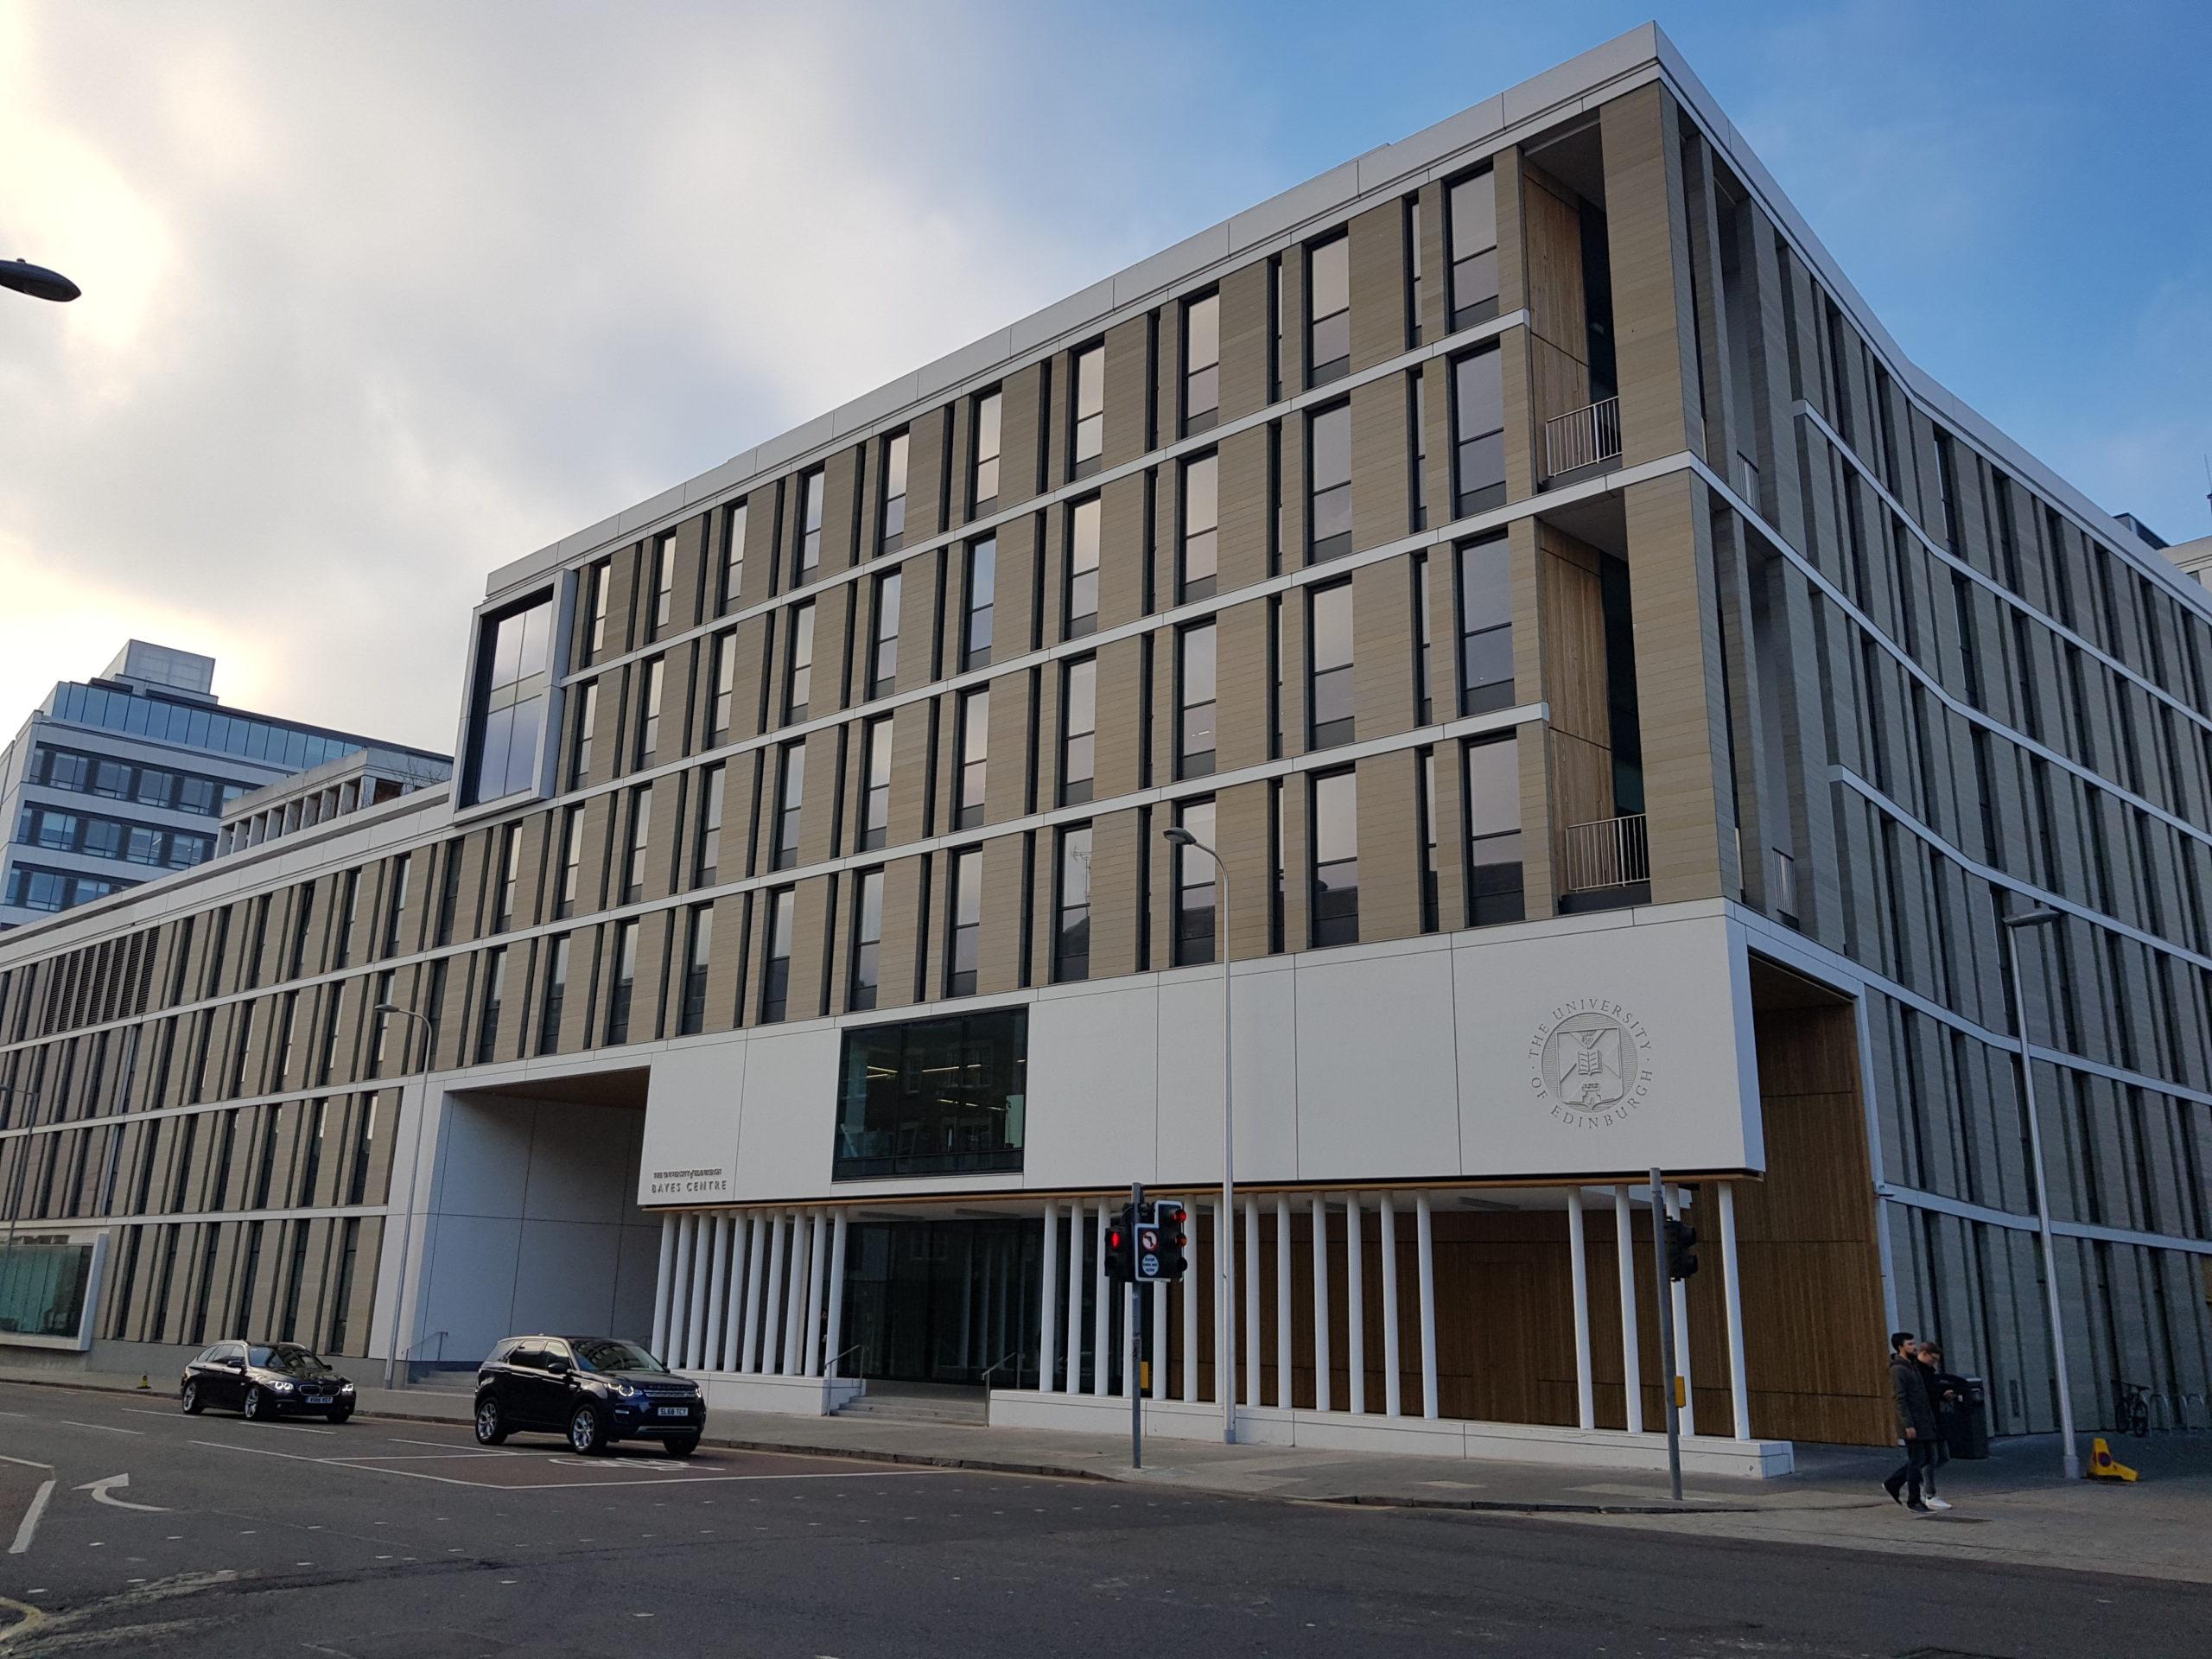 Bayes-Centre-da-Universidade-de-Edimburgo